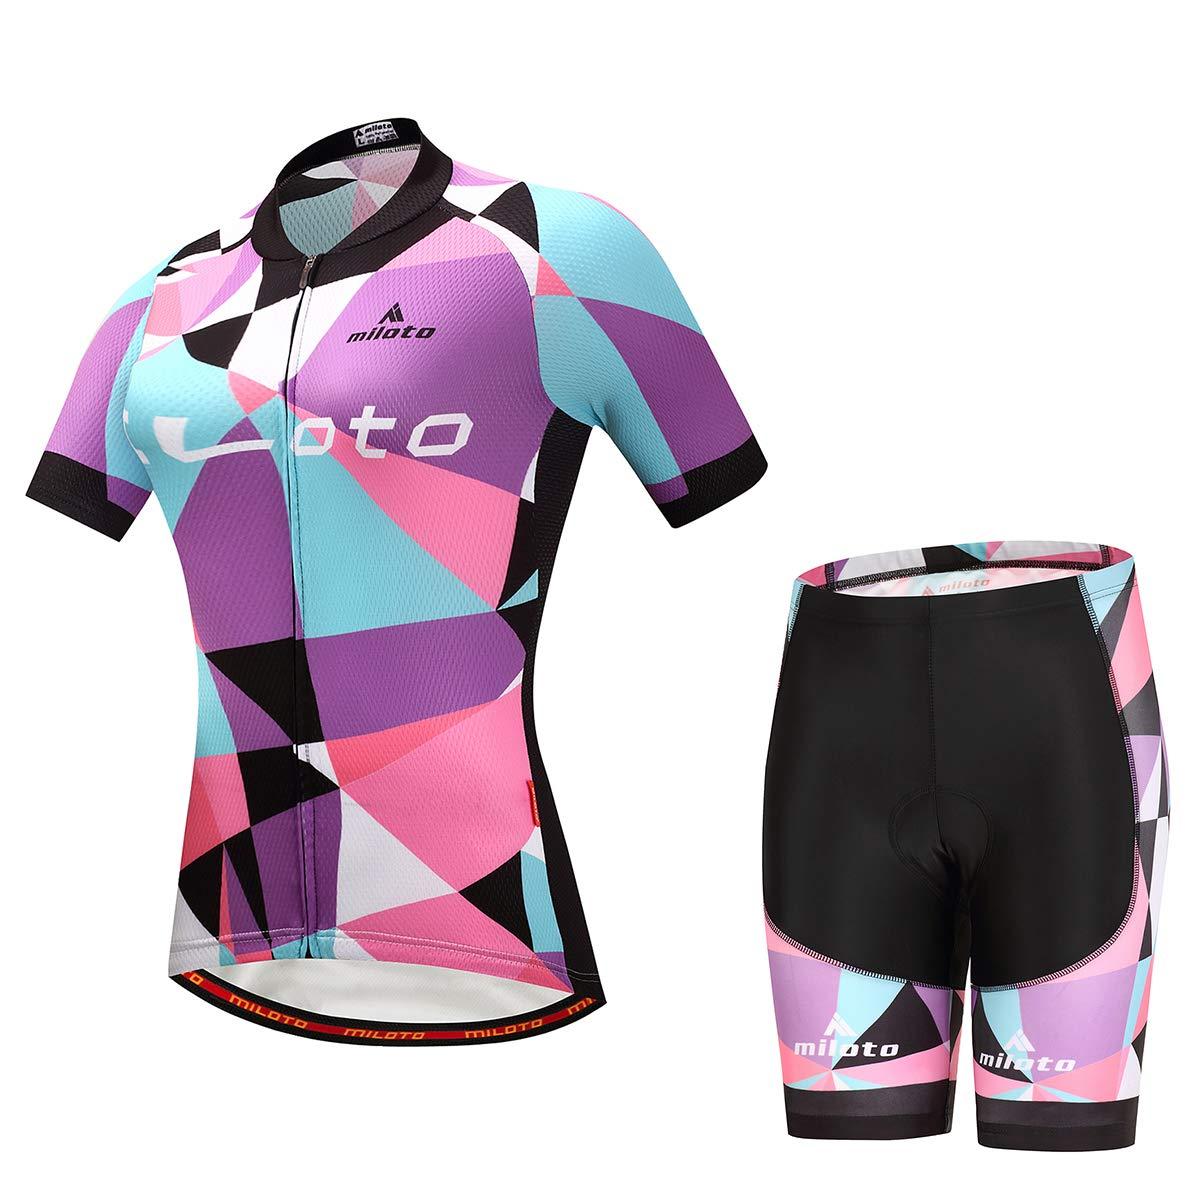 Pink Splinter MILOTO Women's Cycling Jersey Reflective Shirt Padded Shorts Set